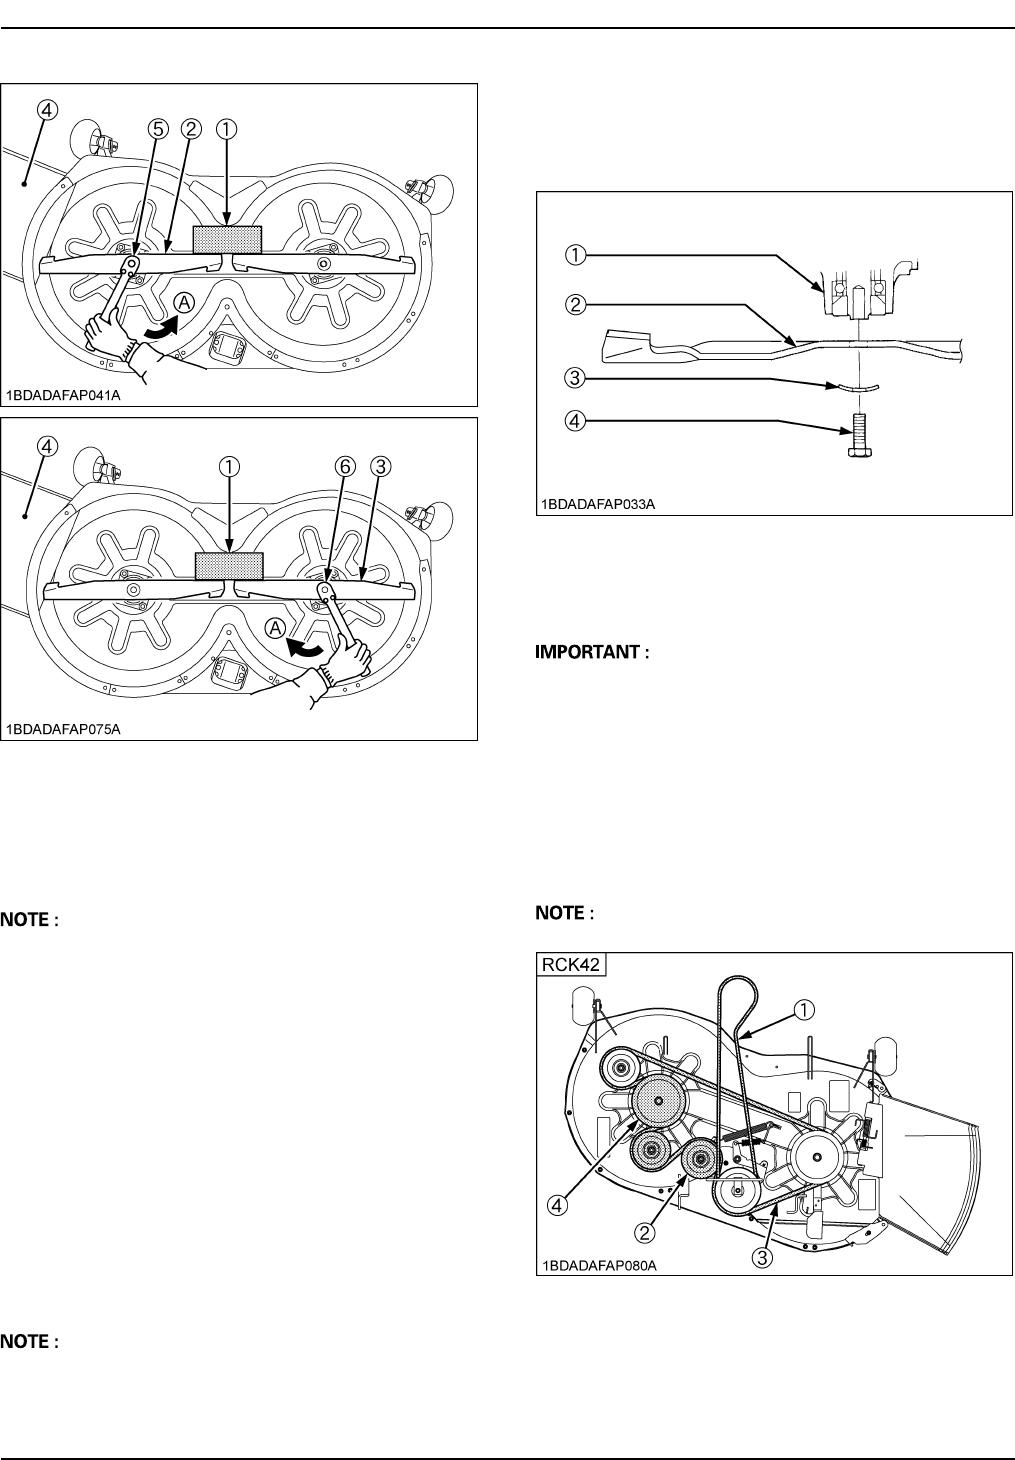 Tremendous Handleiding Kubota T1880 Pagina 67 Van 78 English Wiring 101 Olytiaxxcnl